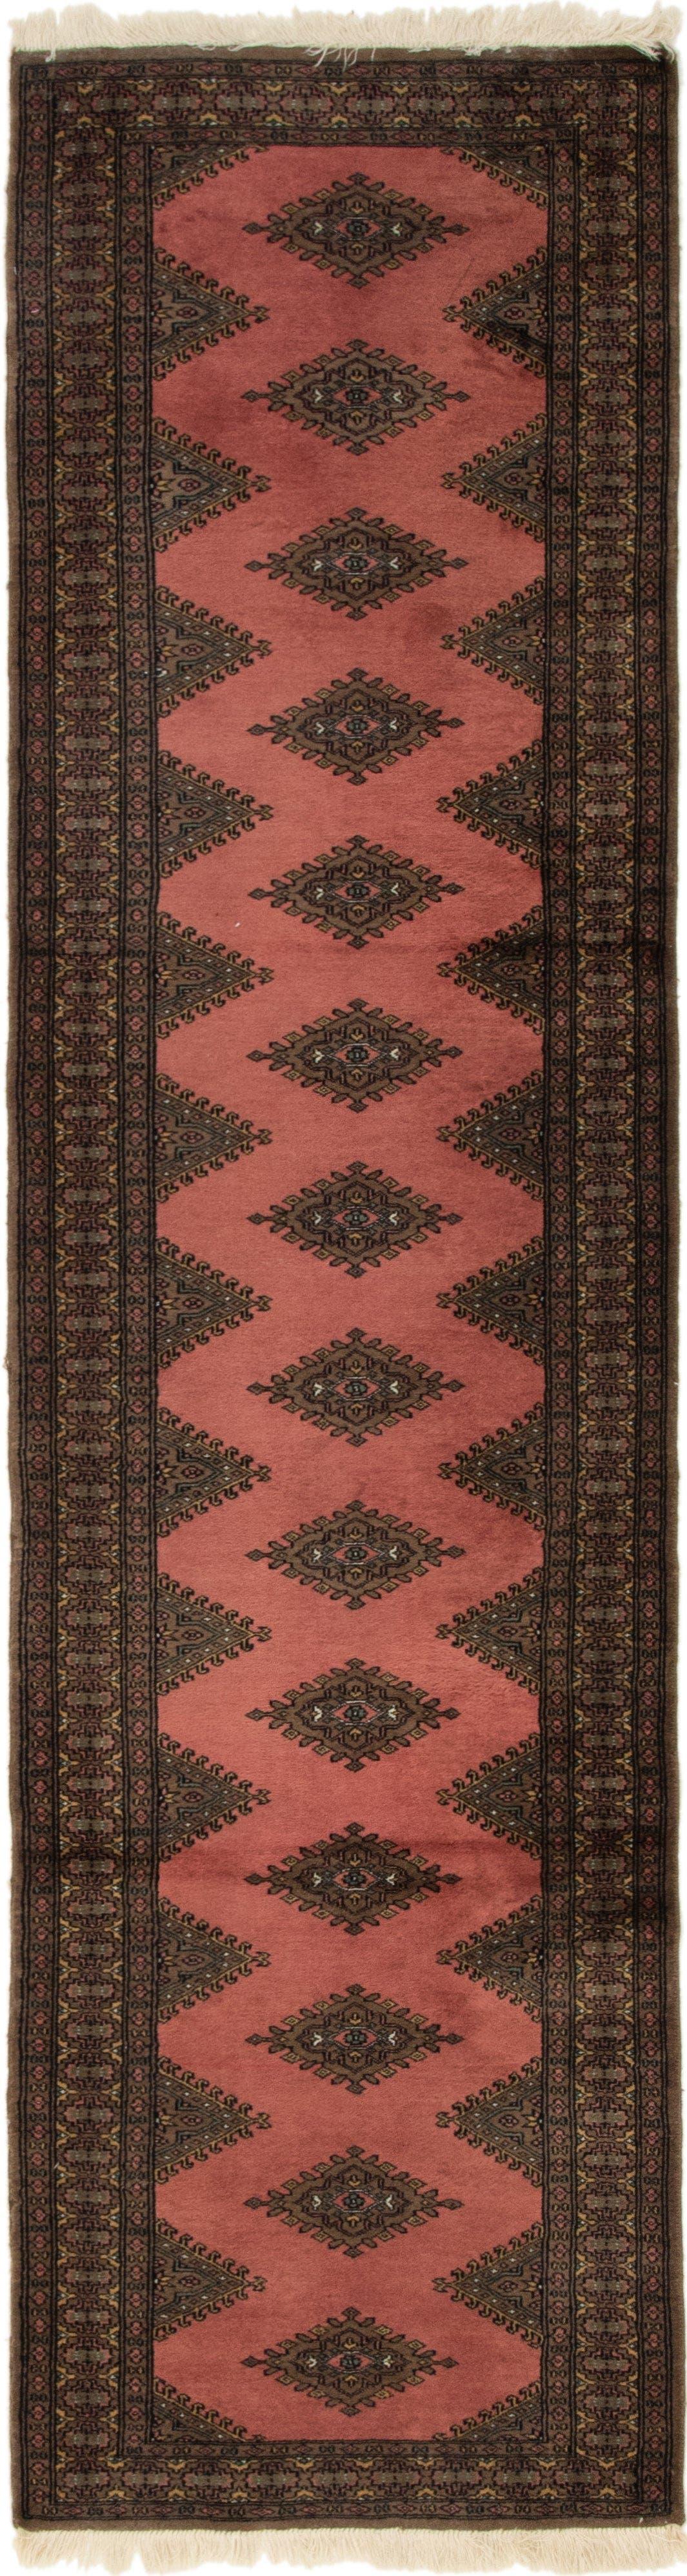 2' 7 x 10' Bokhara Oriental Runner Rug main image